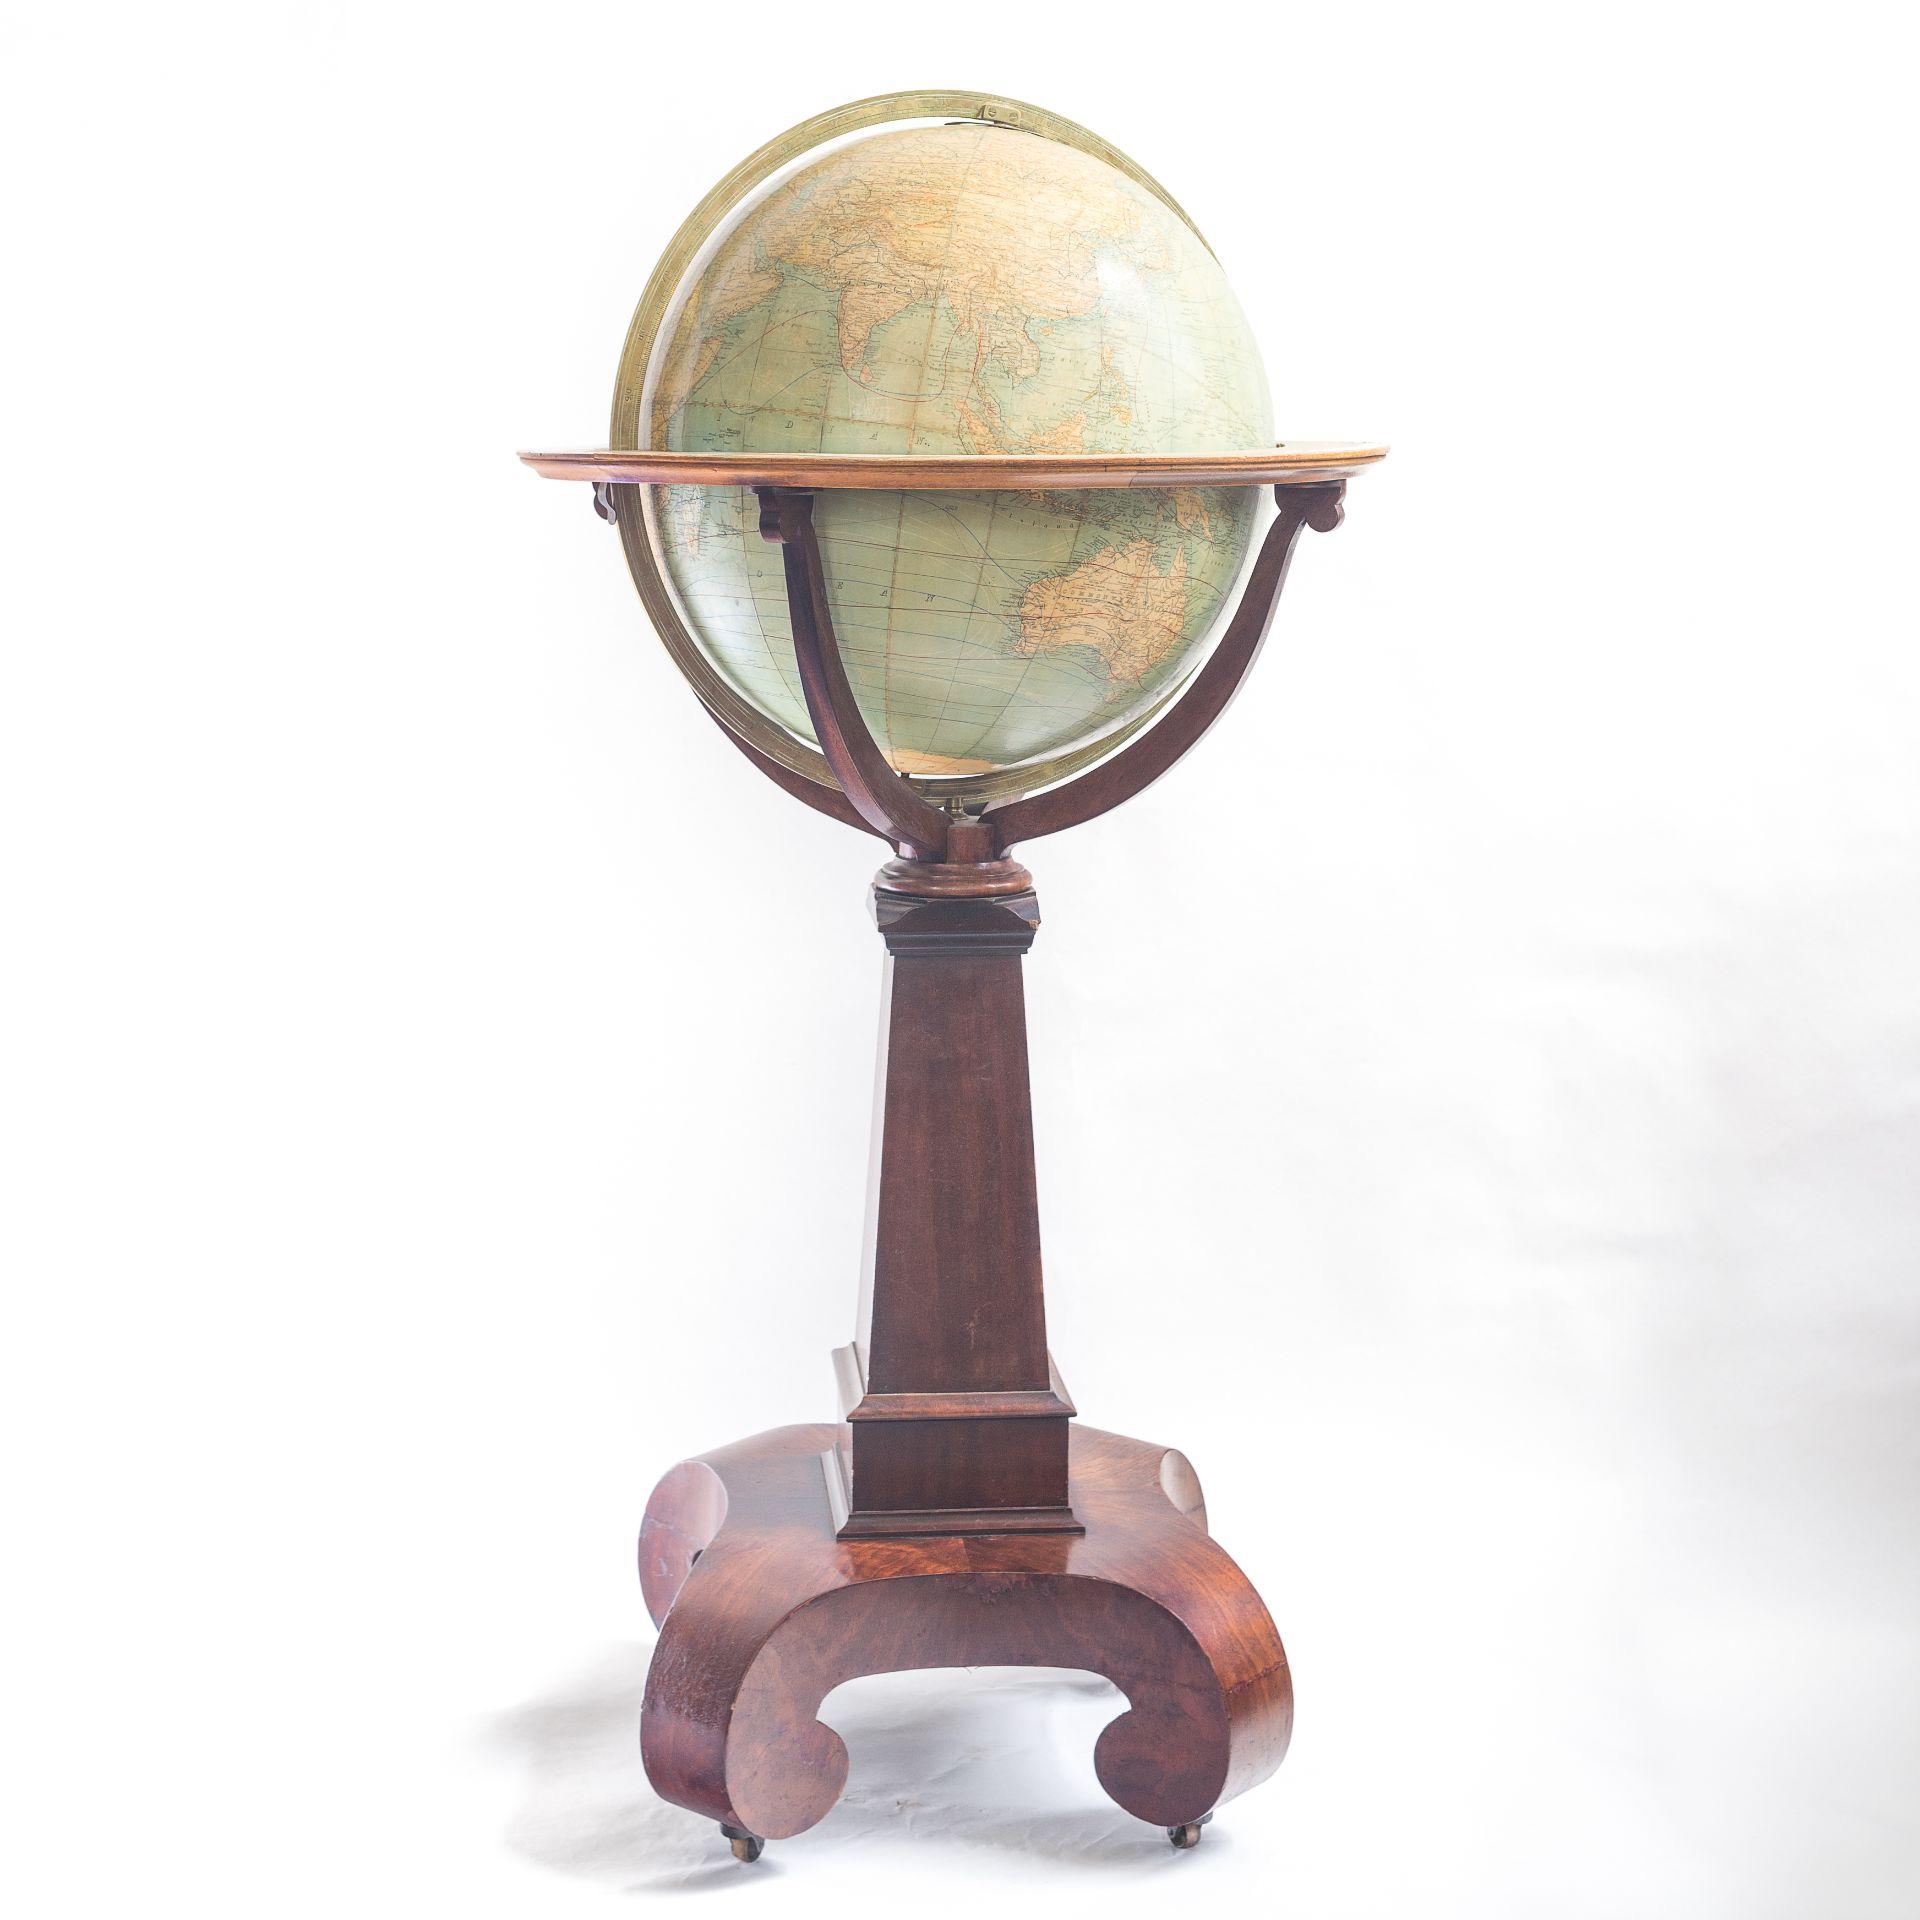 Terrestial globe by W & A.K. Johnston Limited (18 Inch)